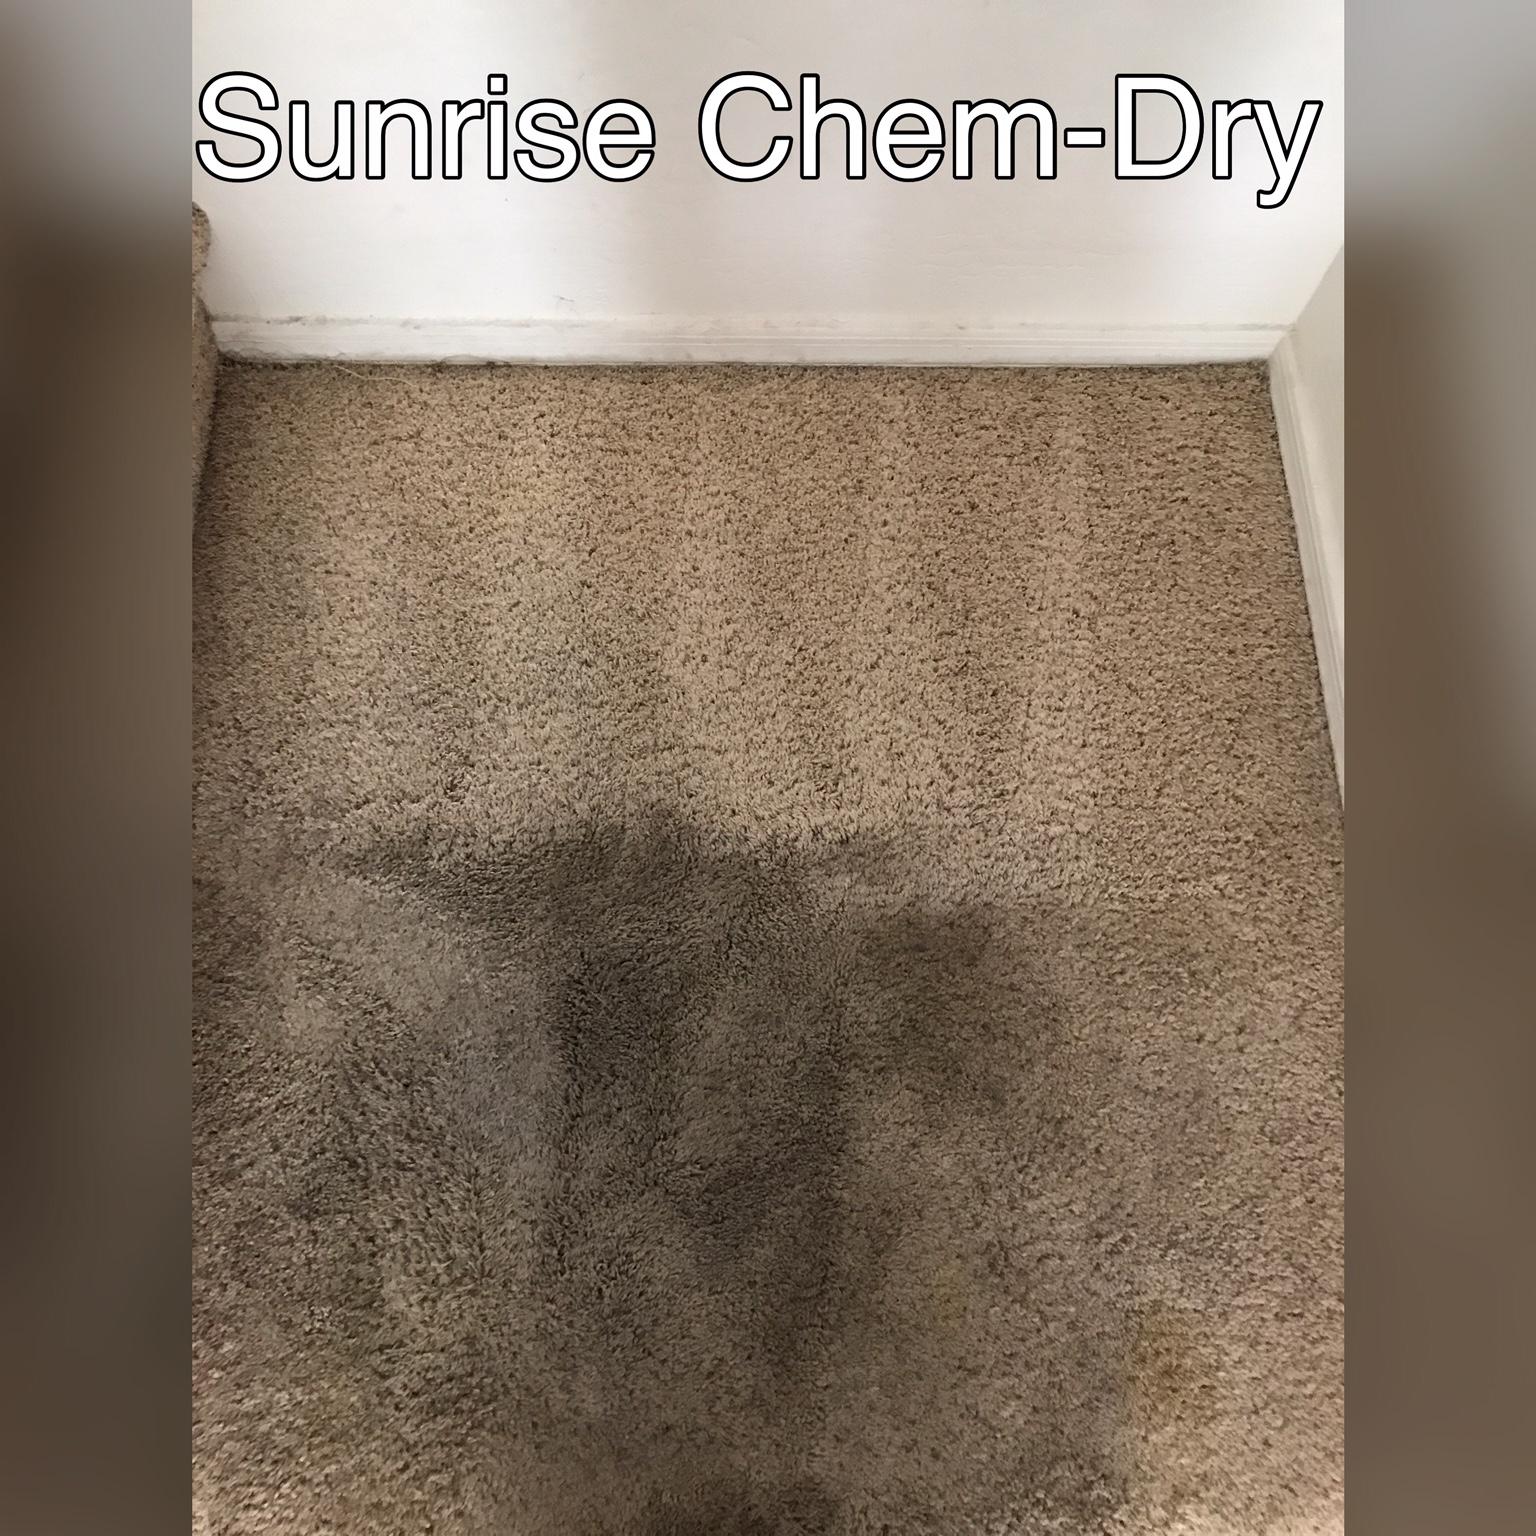 Sunrise Chem Dry In Glendale Az 85308 Chamberofcommerce Com